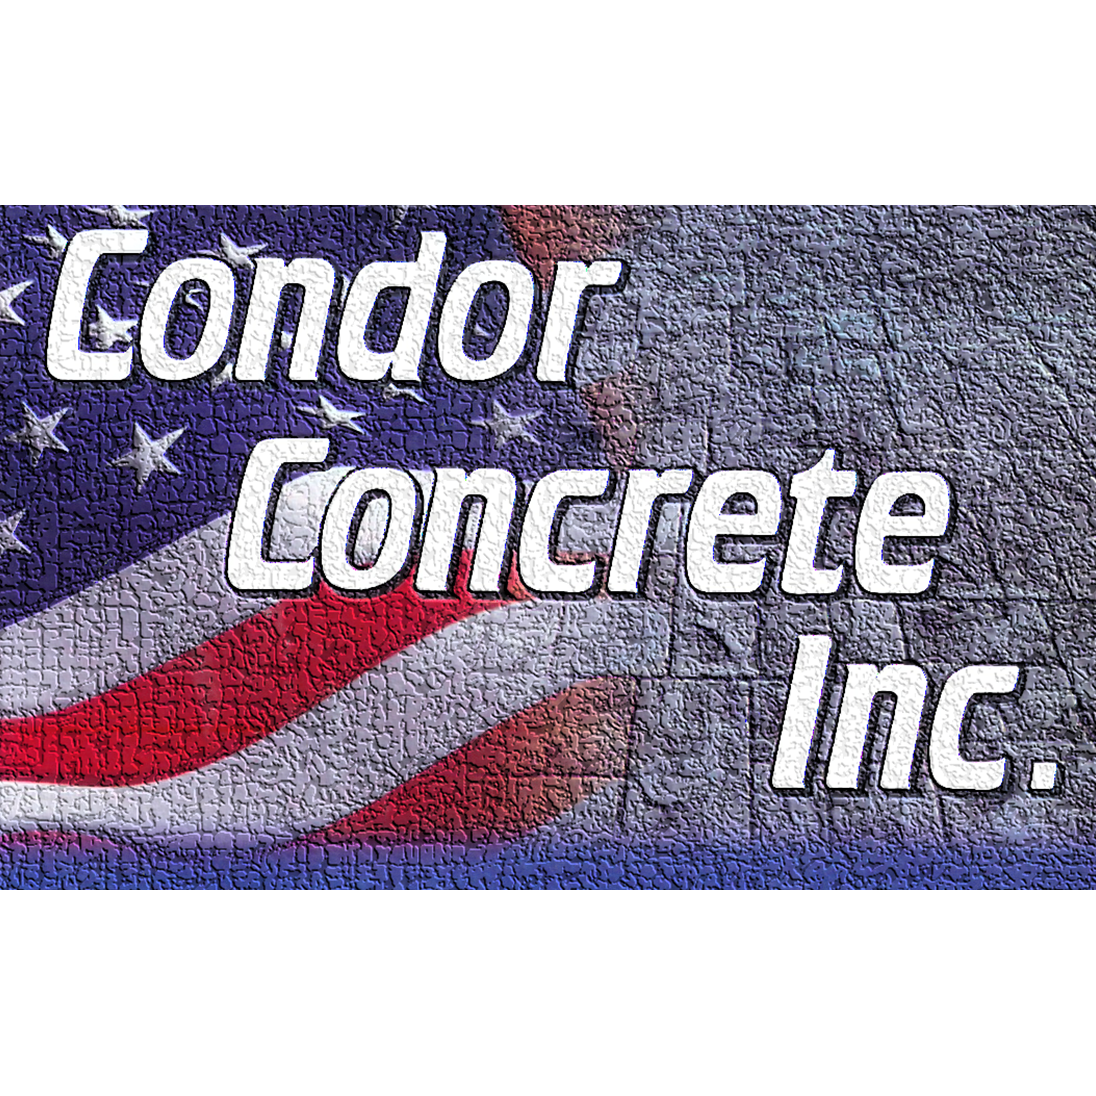 Condor Concrete Inc.